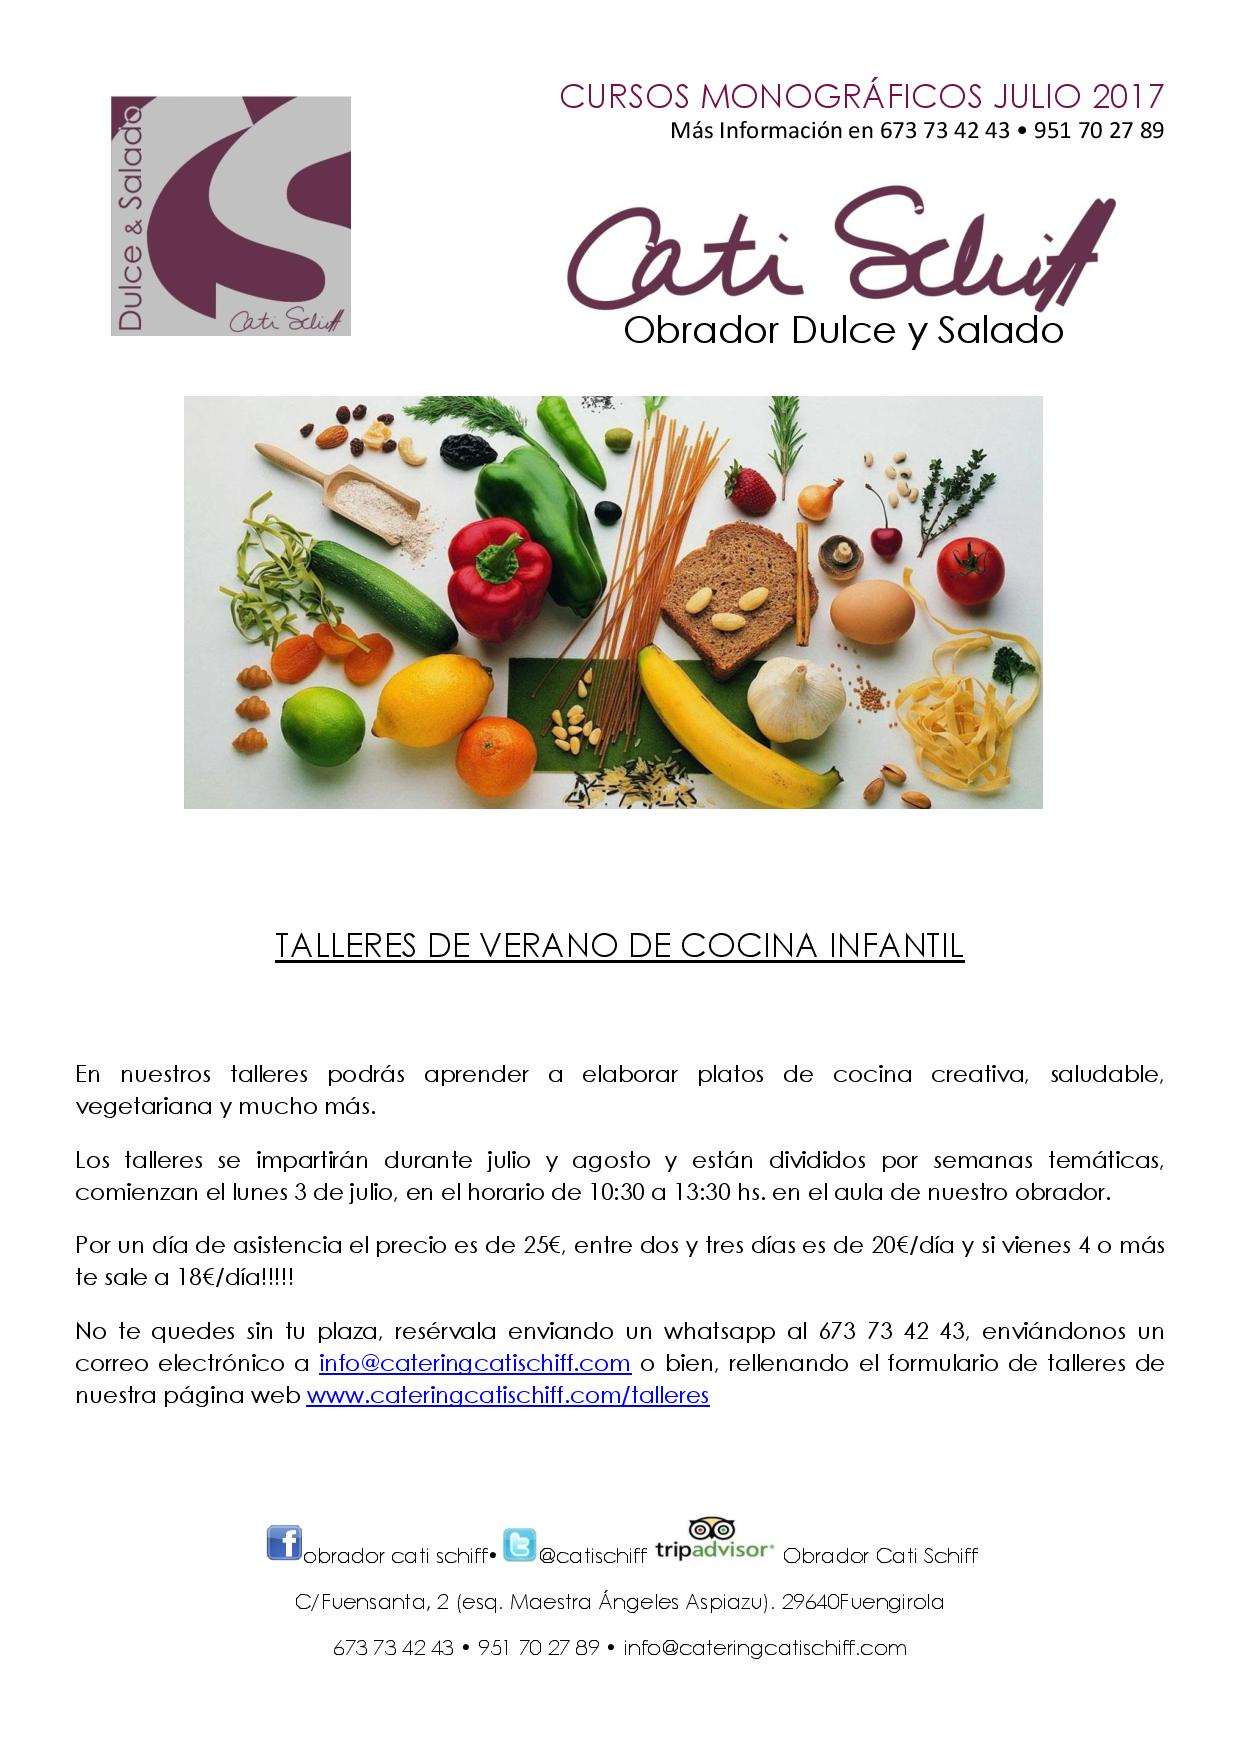 Talleres infantiles de verano catering cati schiff - Talleres de cocina infantil ...